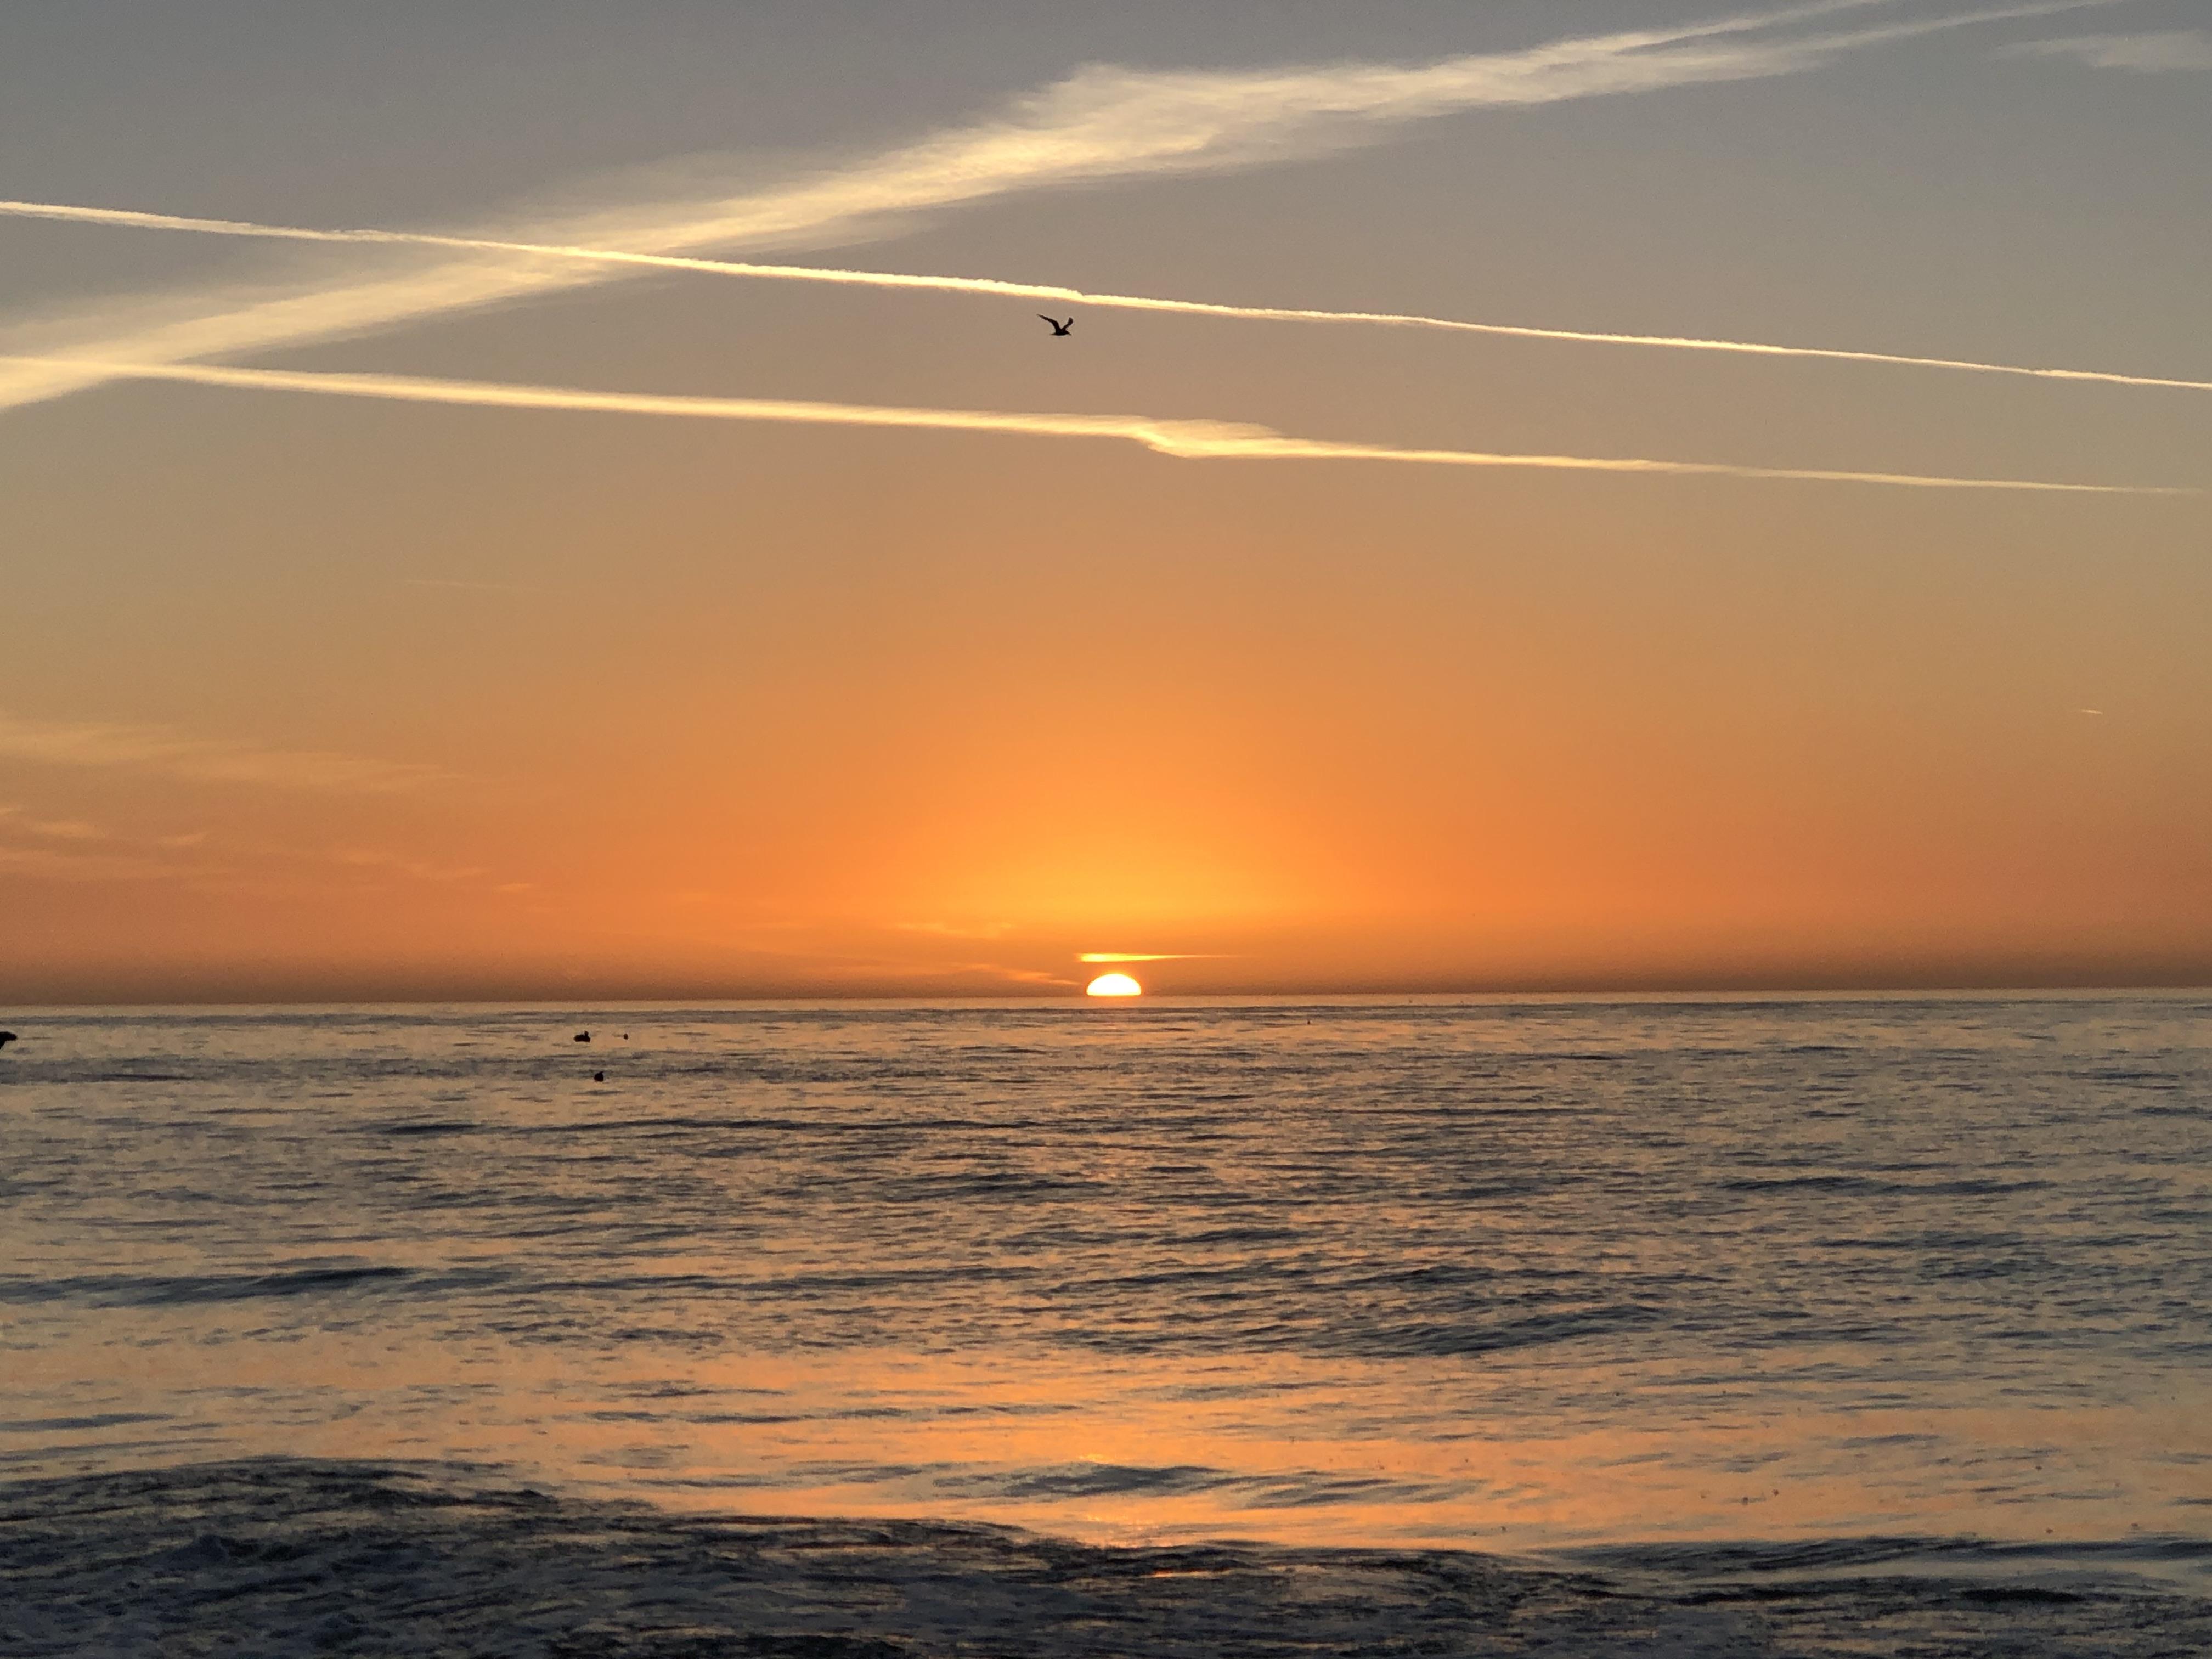 sunset 12-30-18